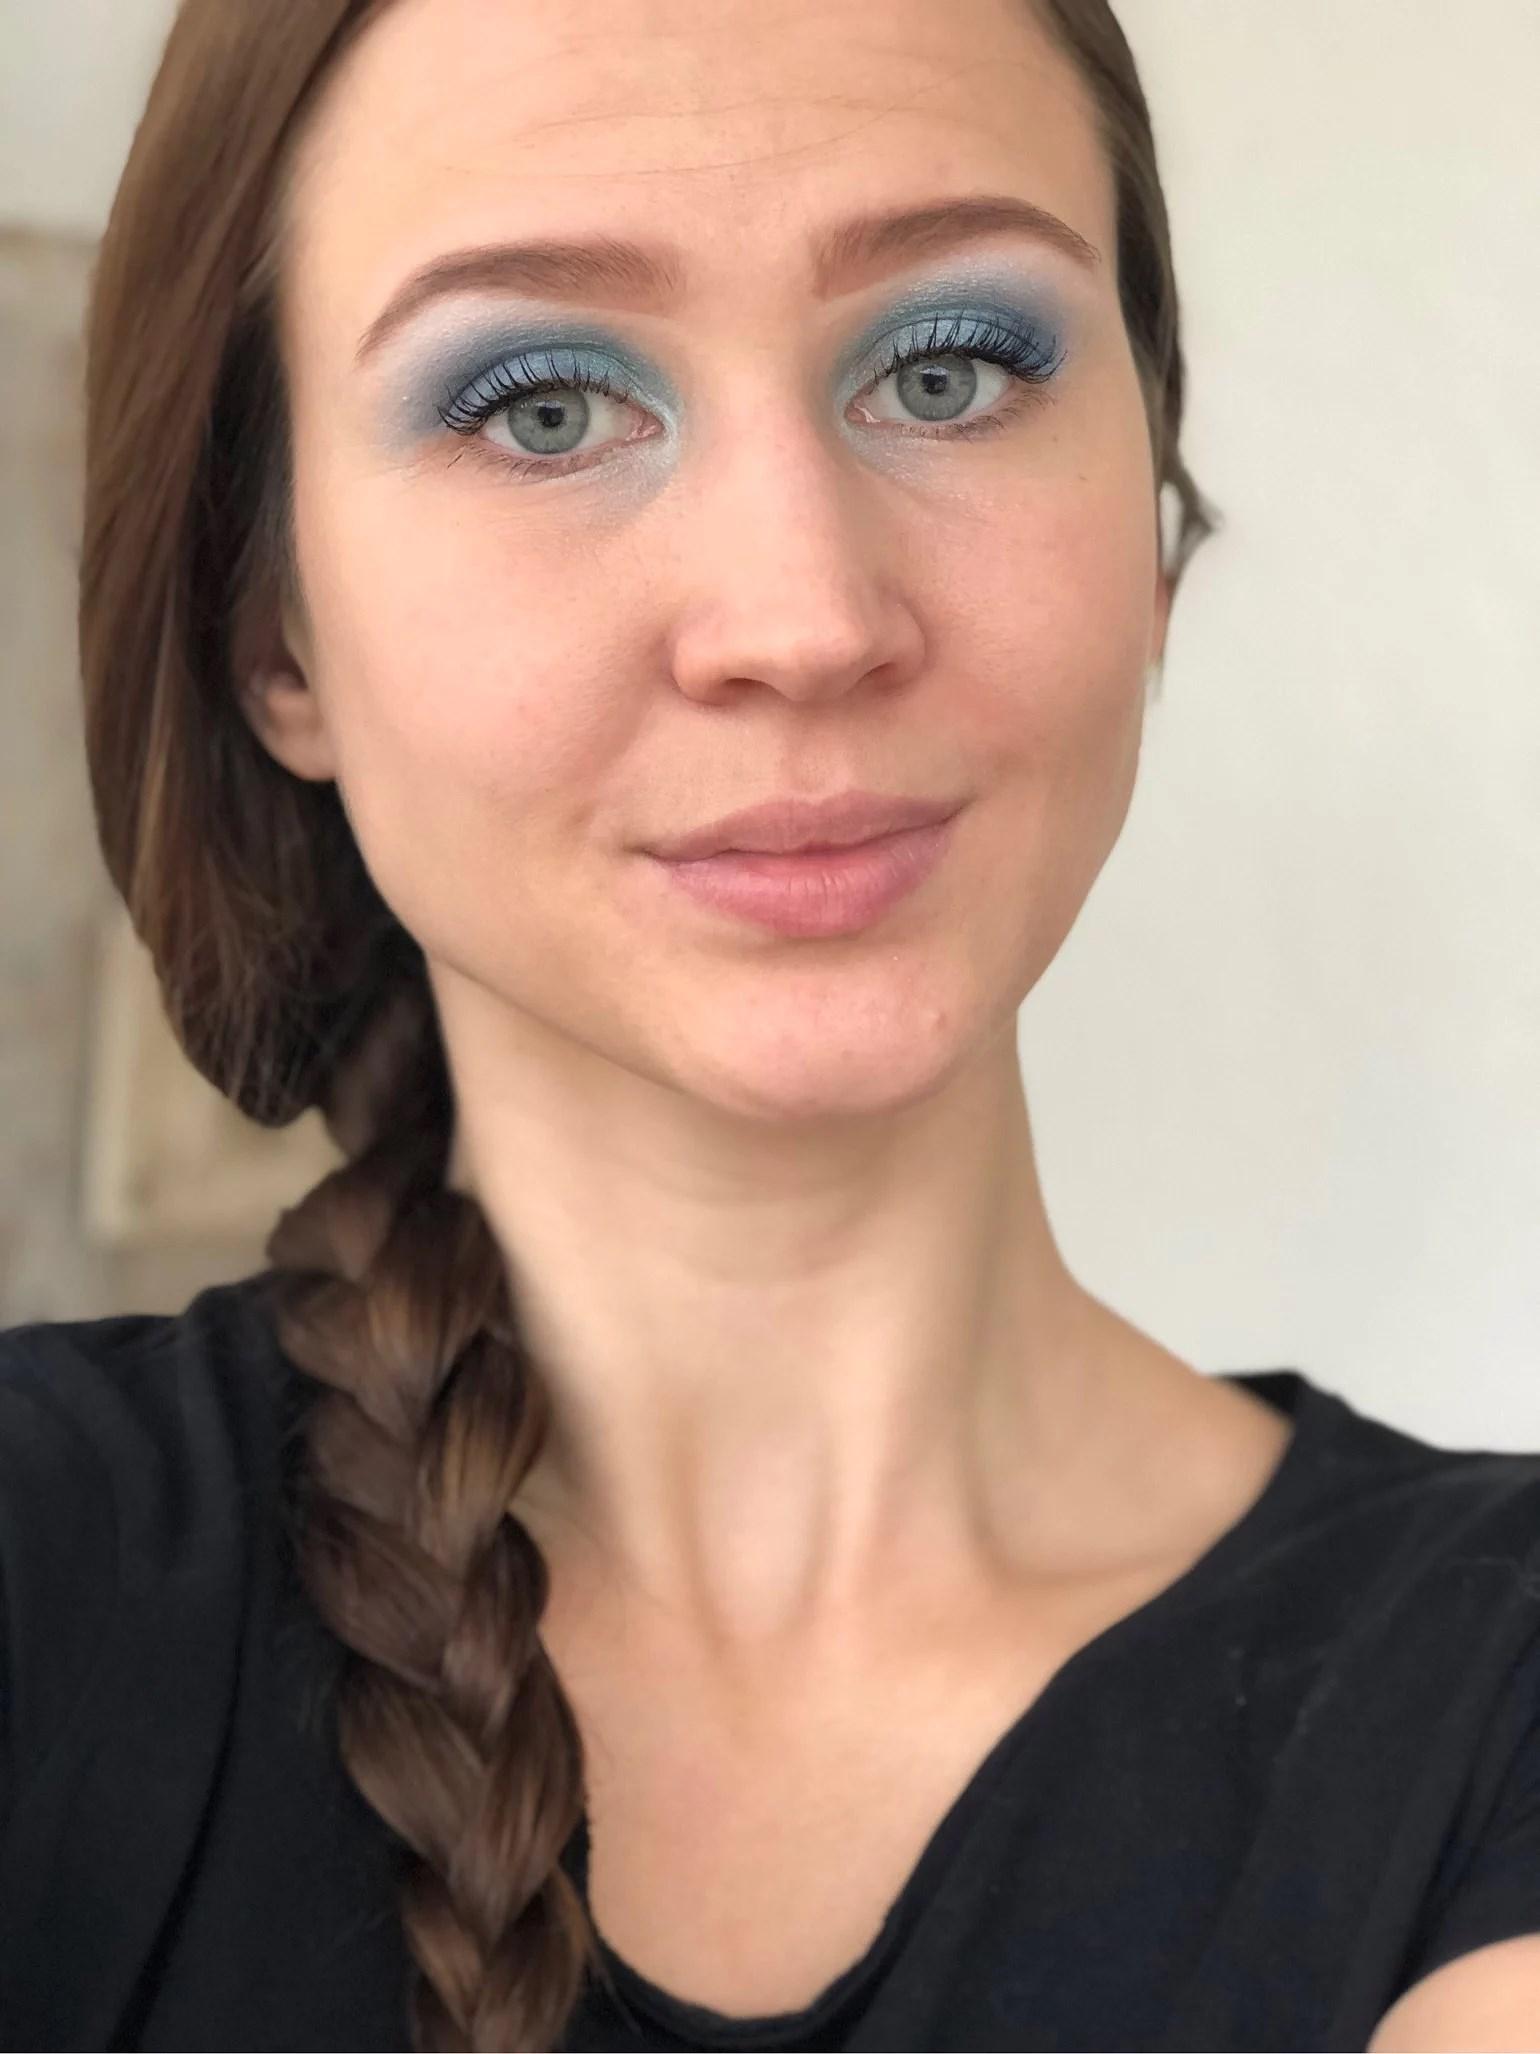 Three shades of blue